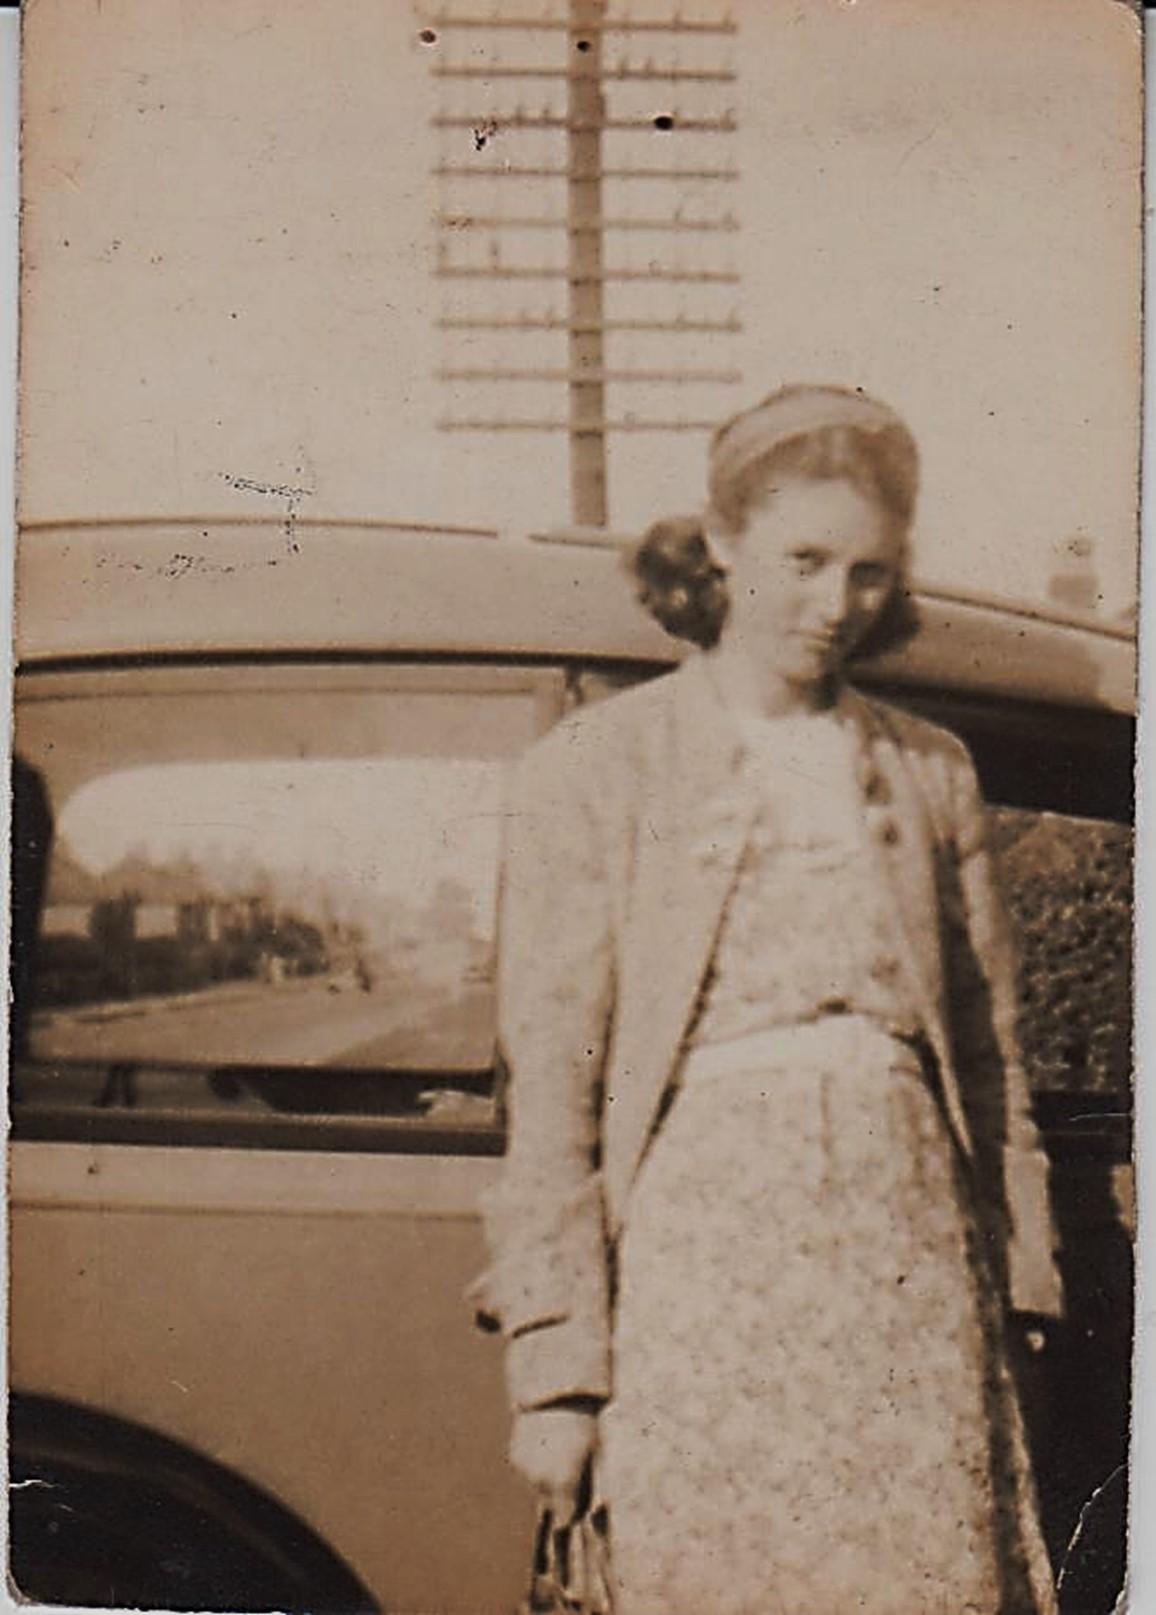 phil_girl_friend__maybe_1938_001.jpg